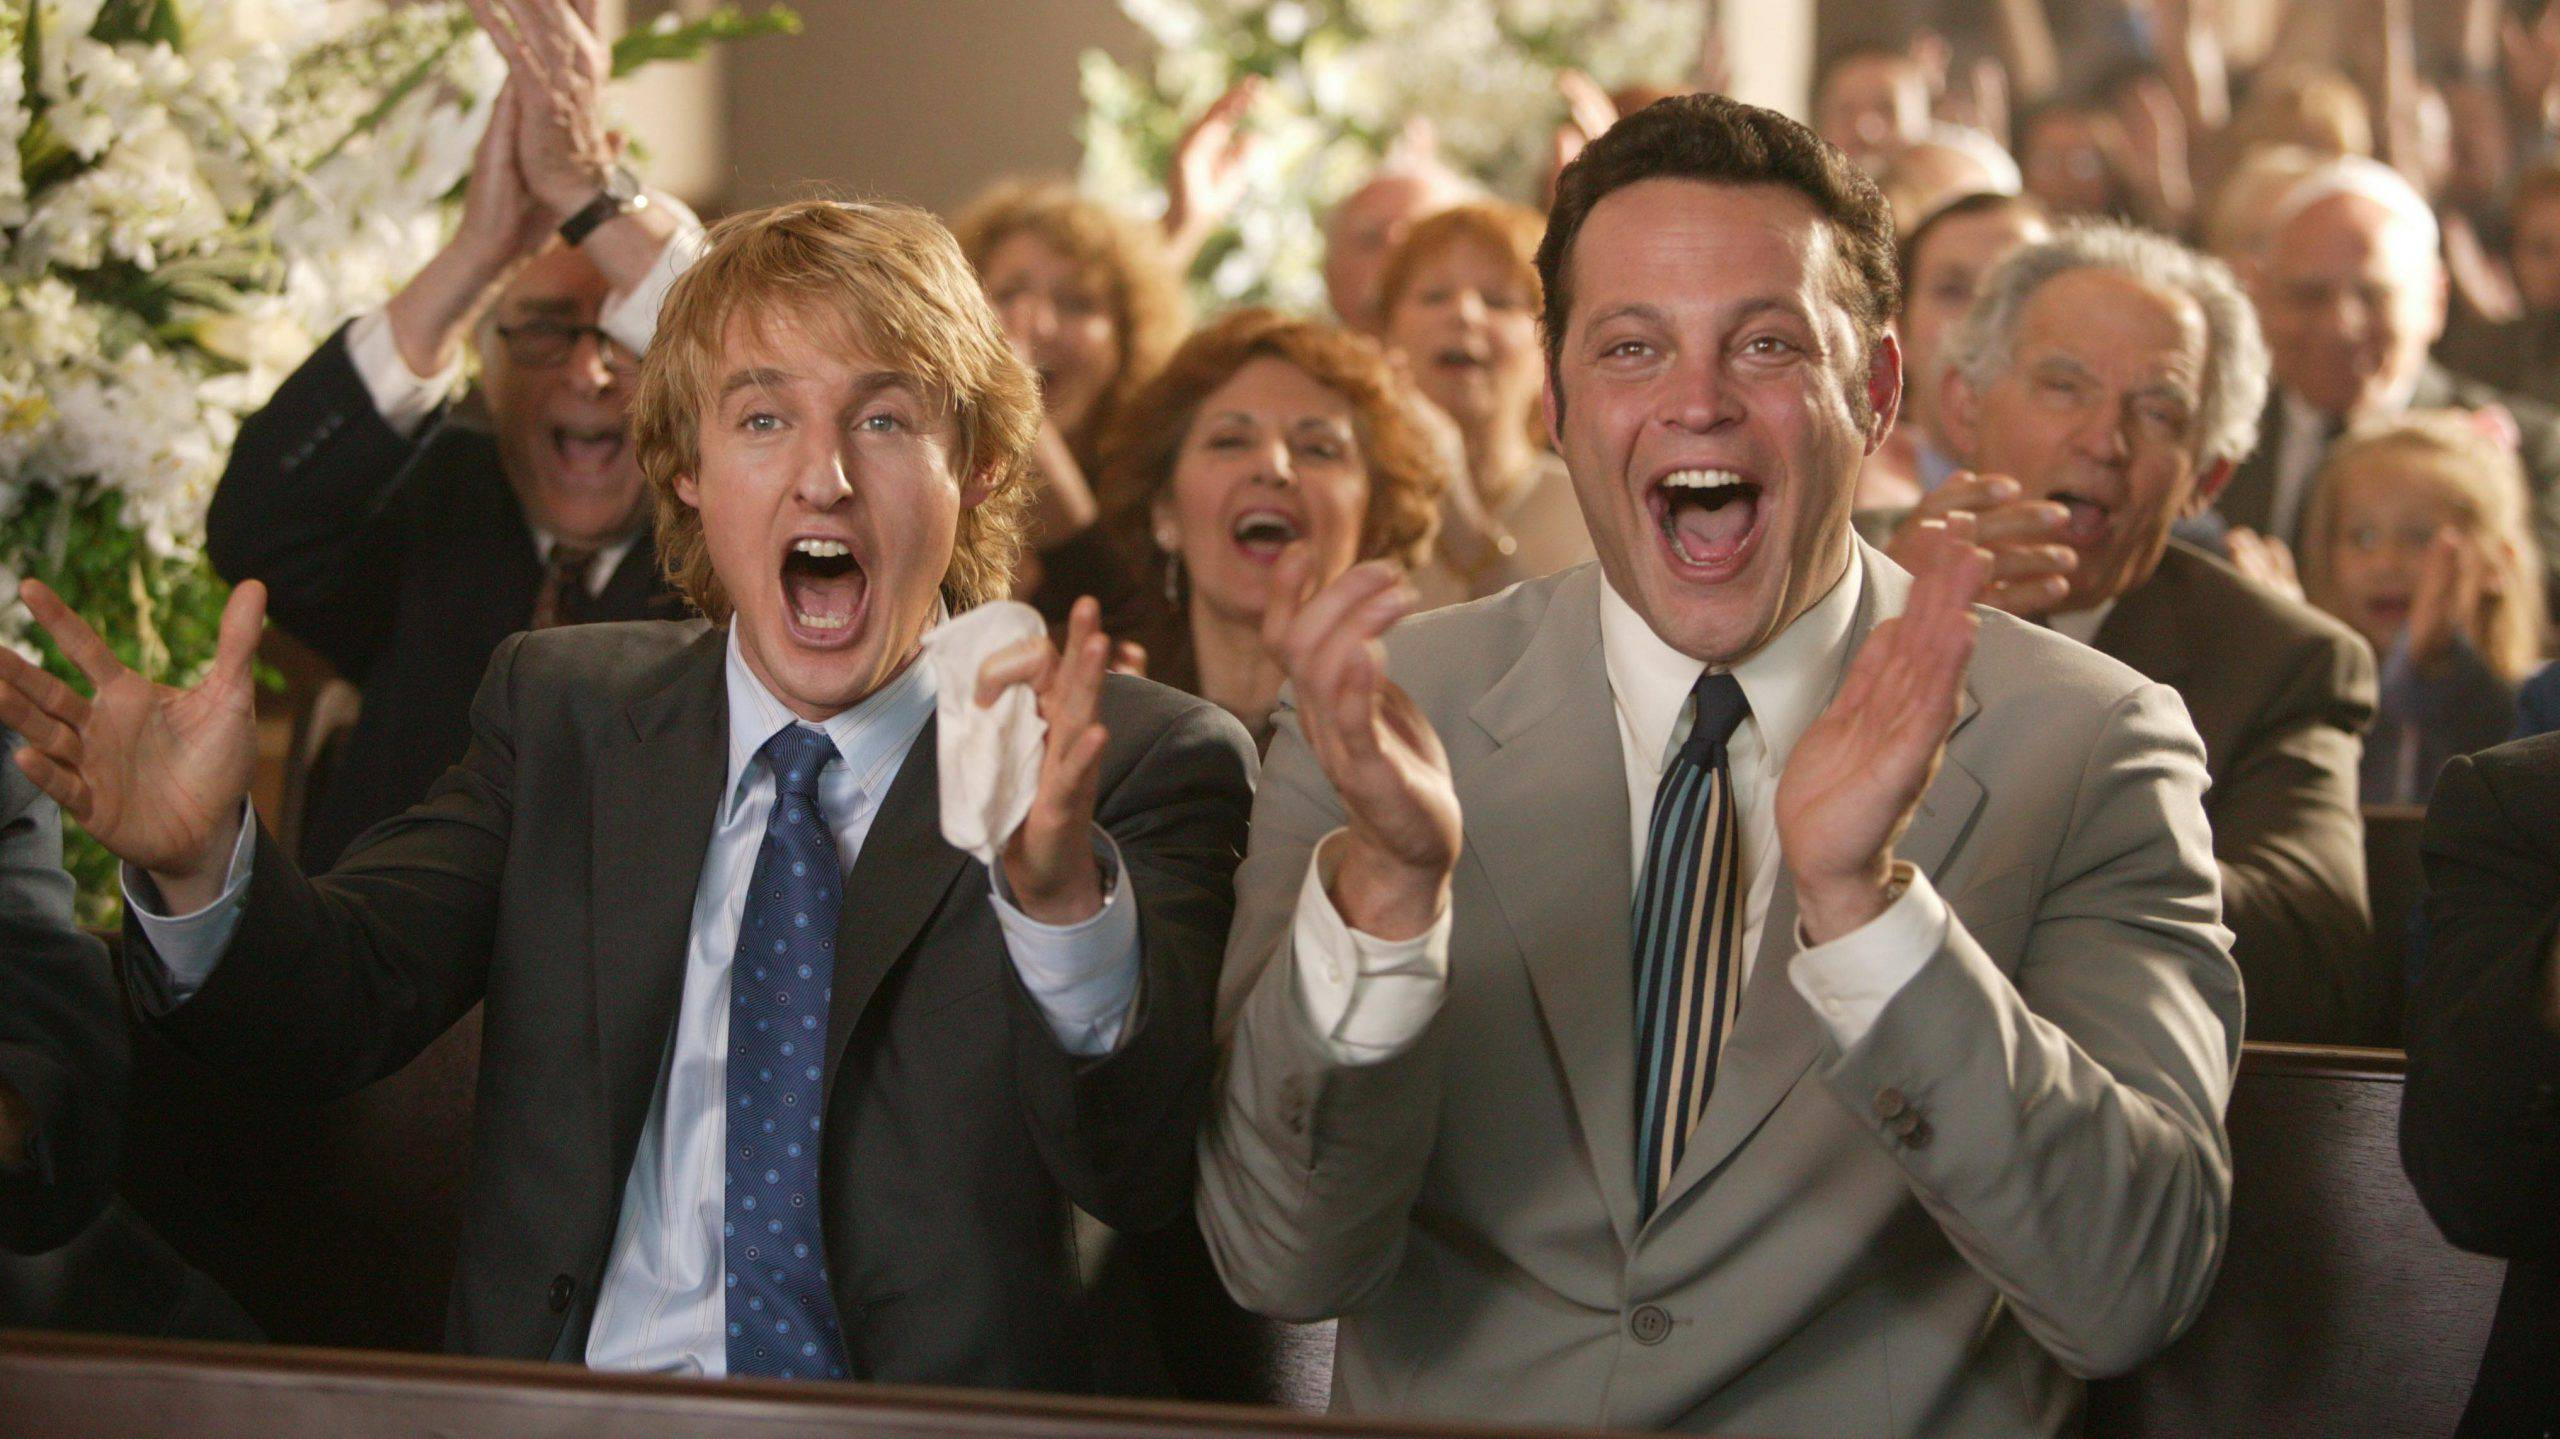 2 single a nozze - Wedding Crashers: trama e cast del film